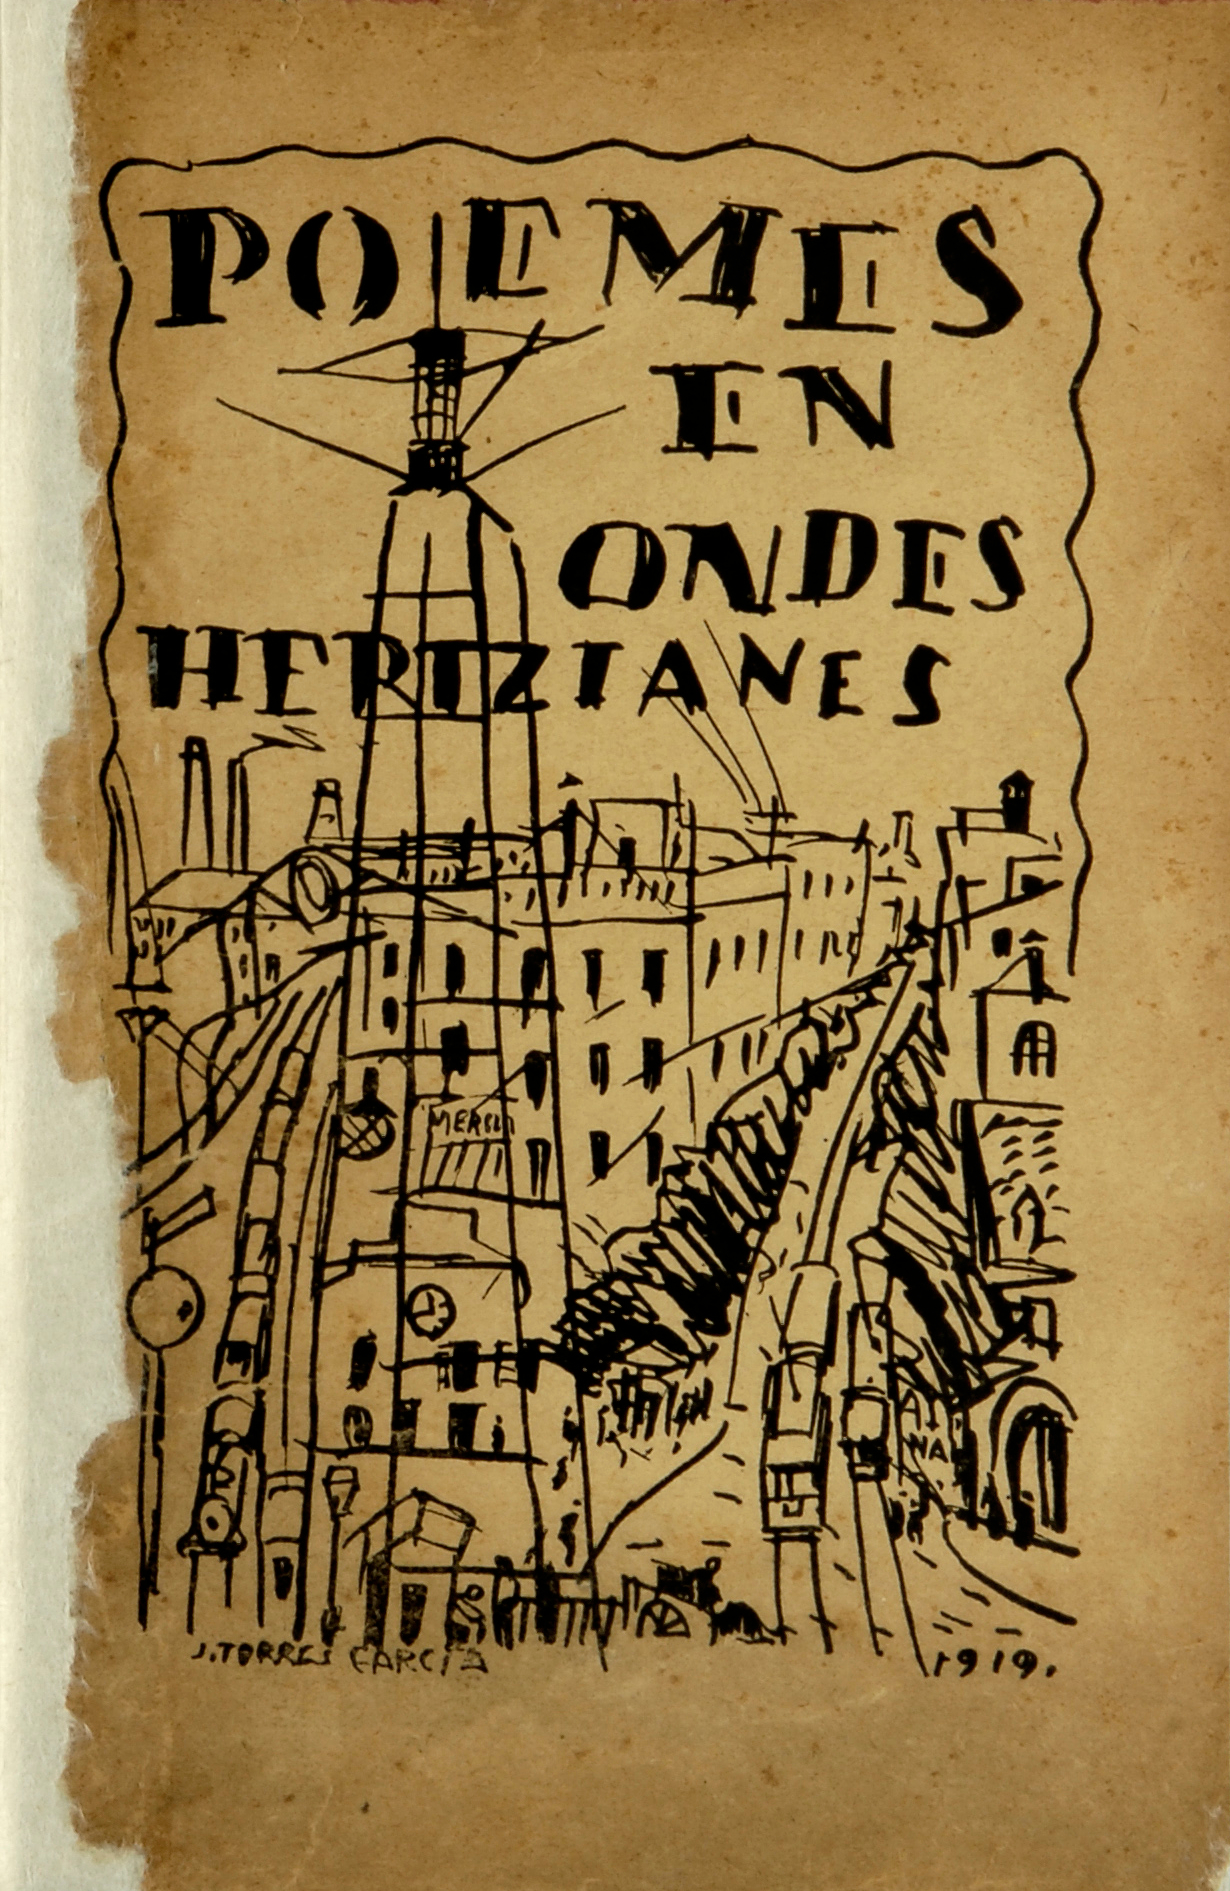 Poemes en ondes hertzianes (1919)